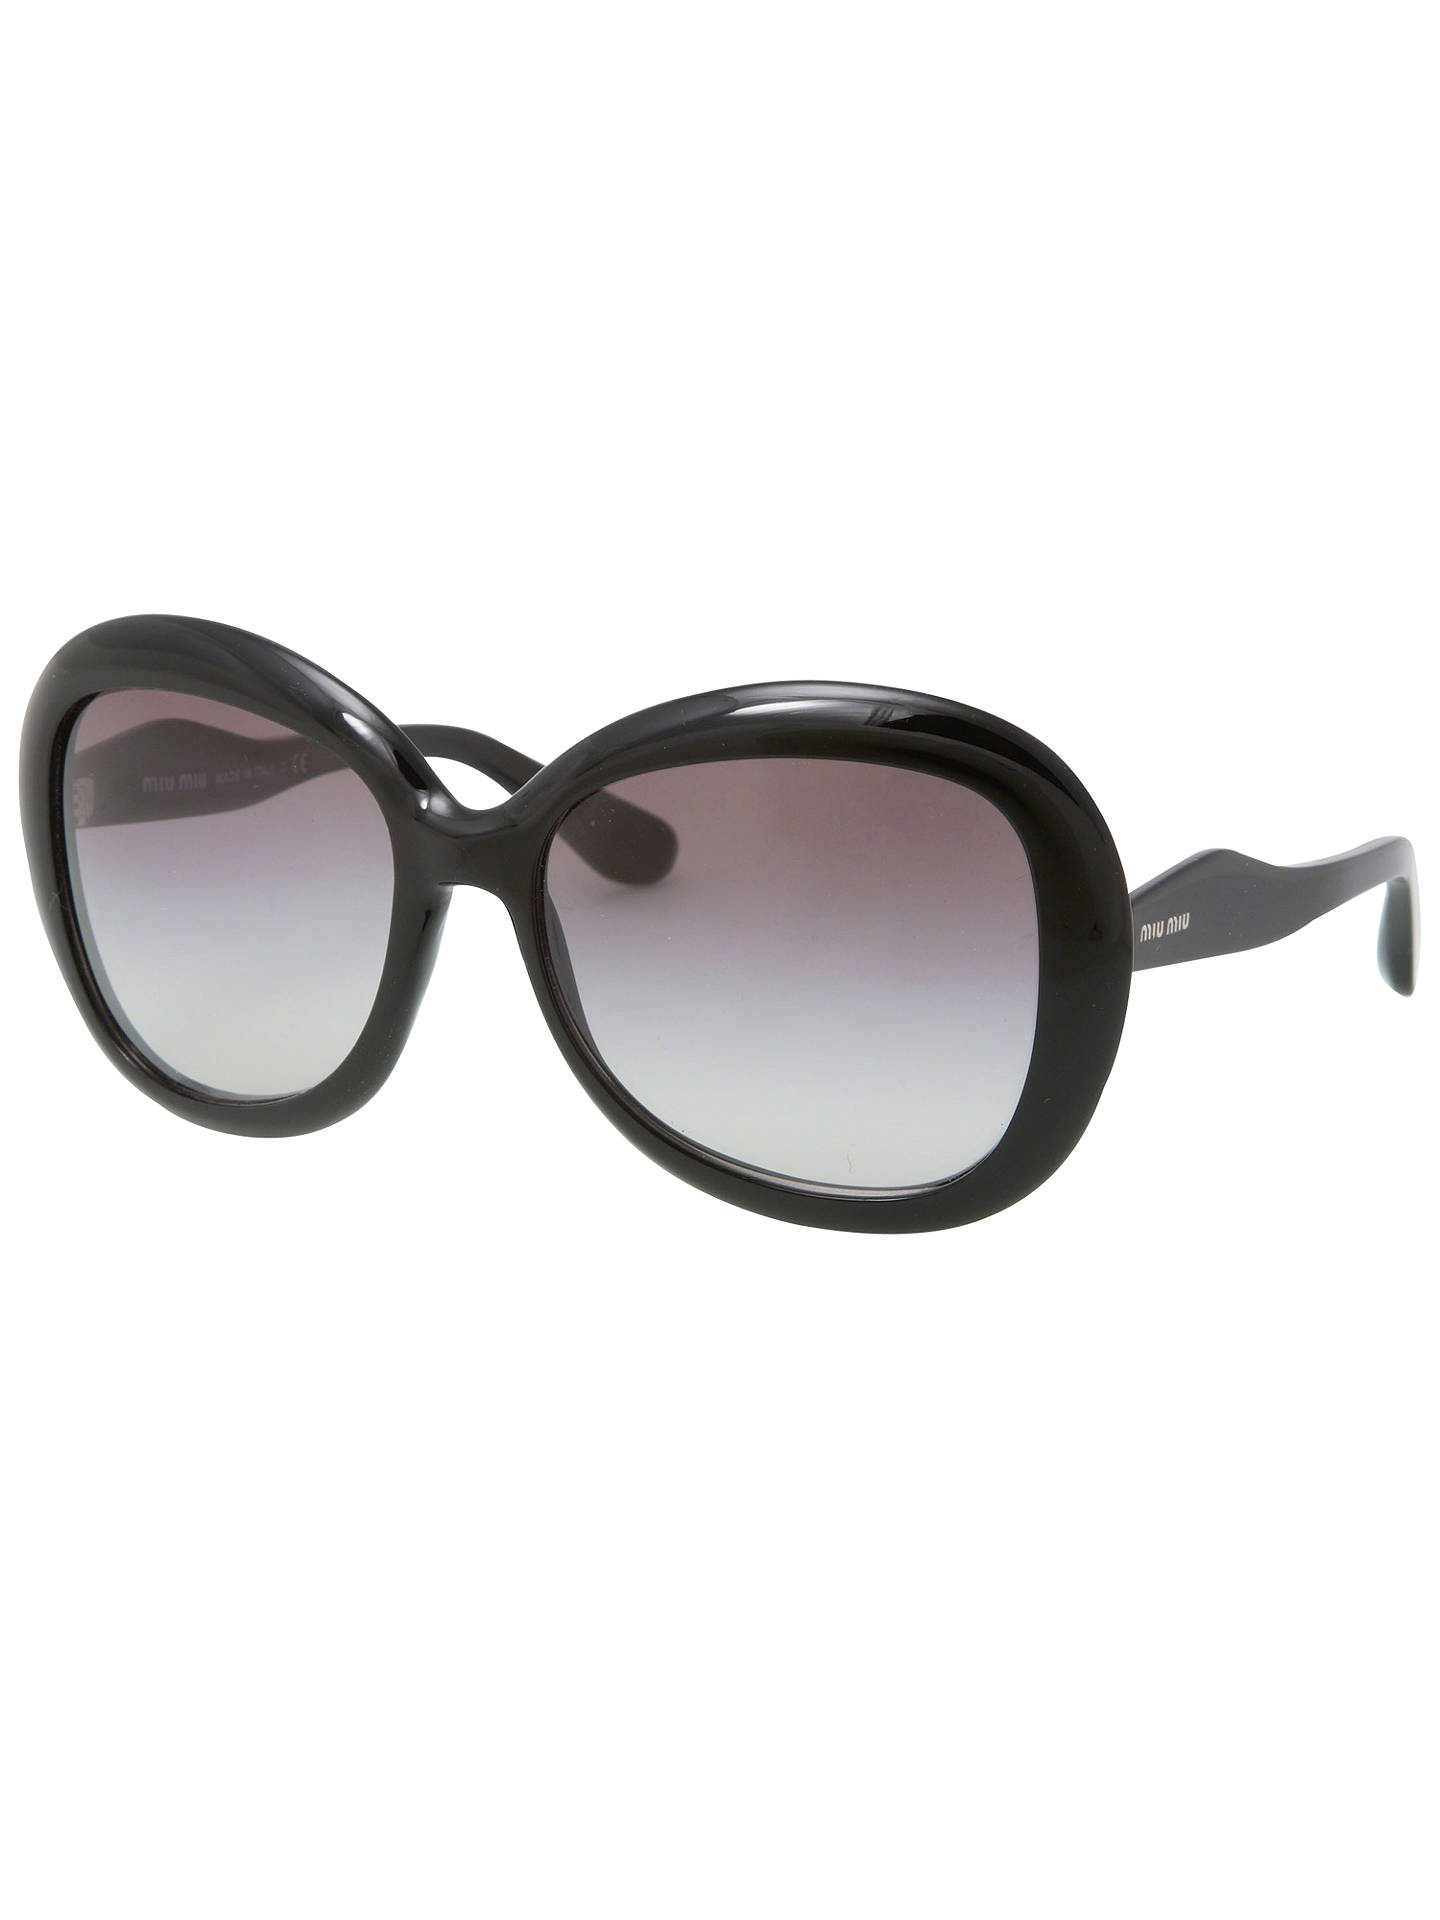 68764b79c2d1 BuyMiu Miu MU 56RS Cat s Eye Sunglasses